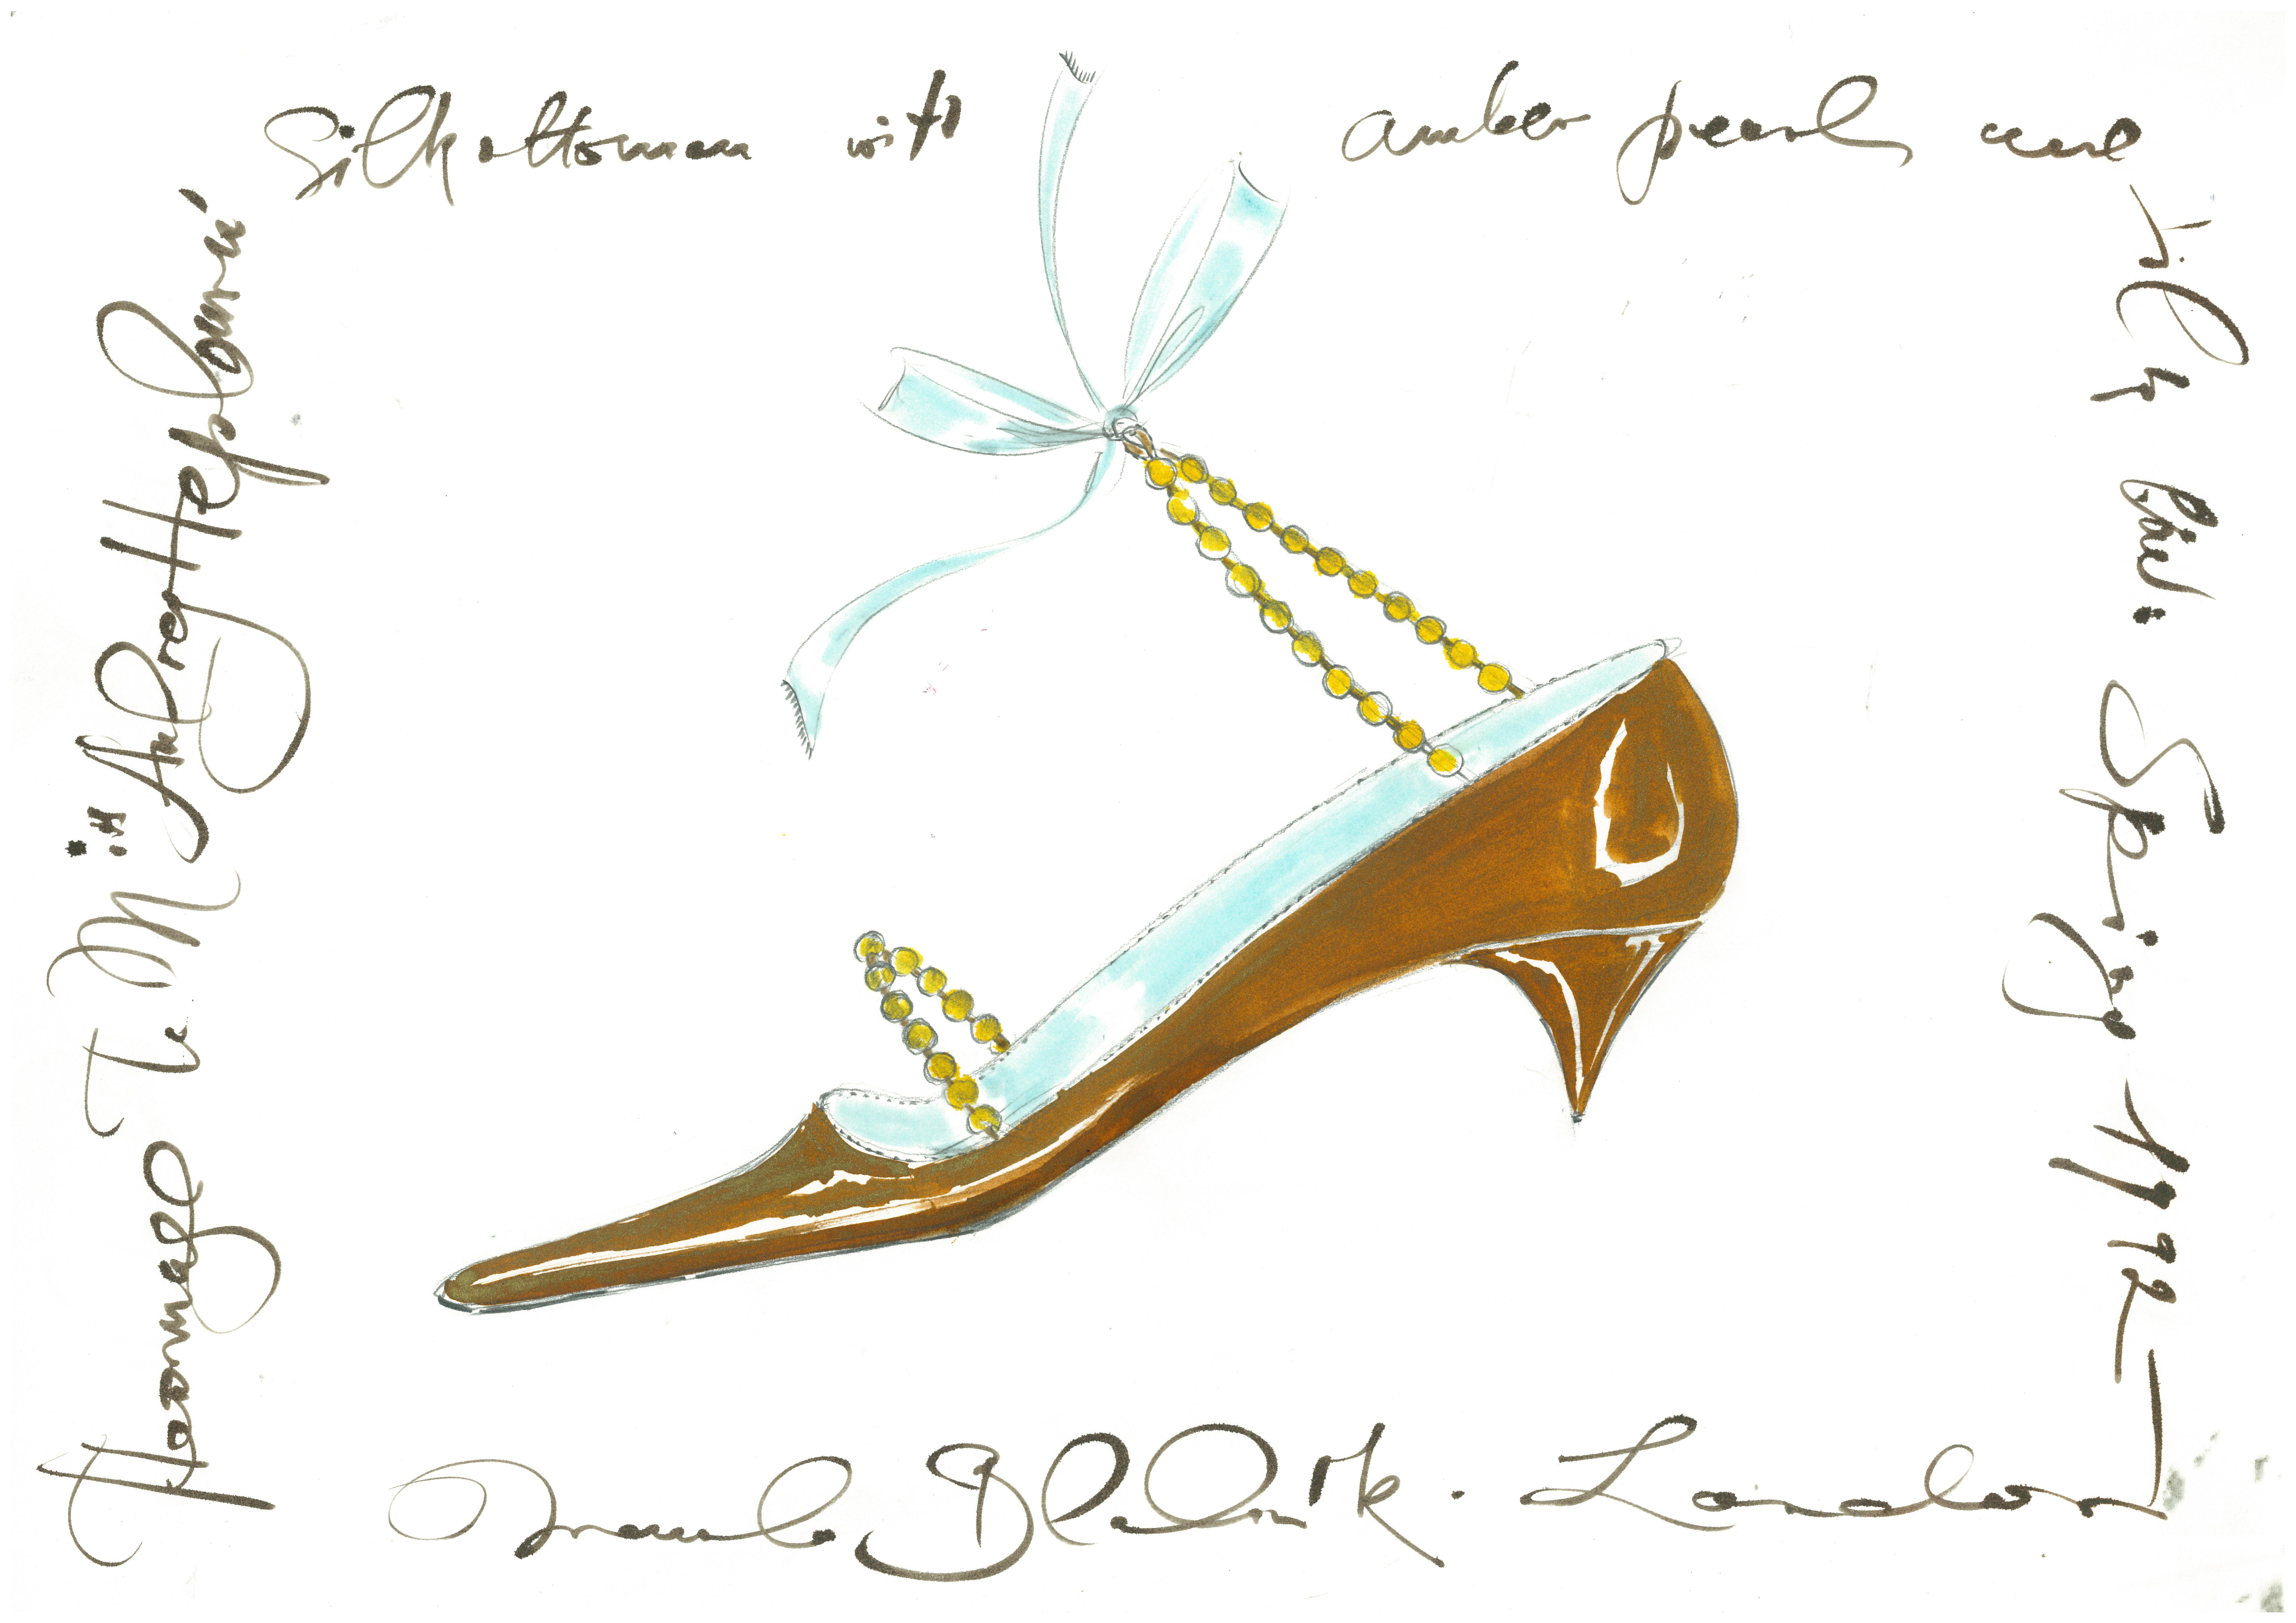 Manolo Blahnik illustration 'Audrey shoe', image c o Manolo Blahnik.jpg